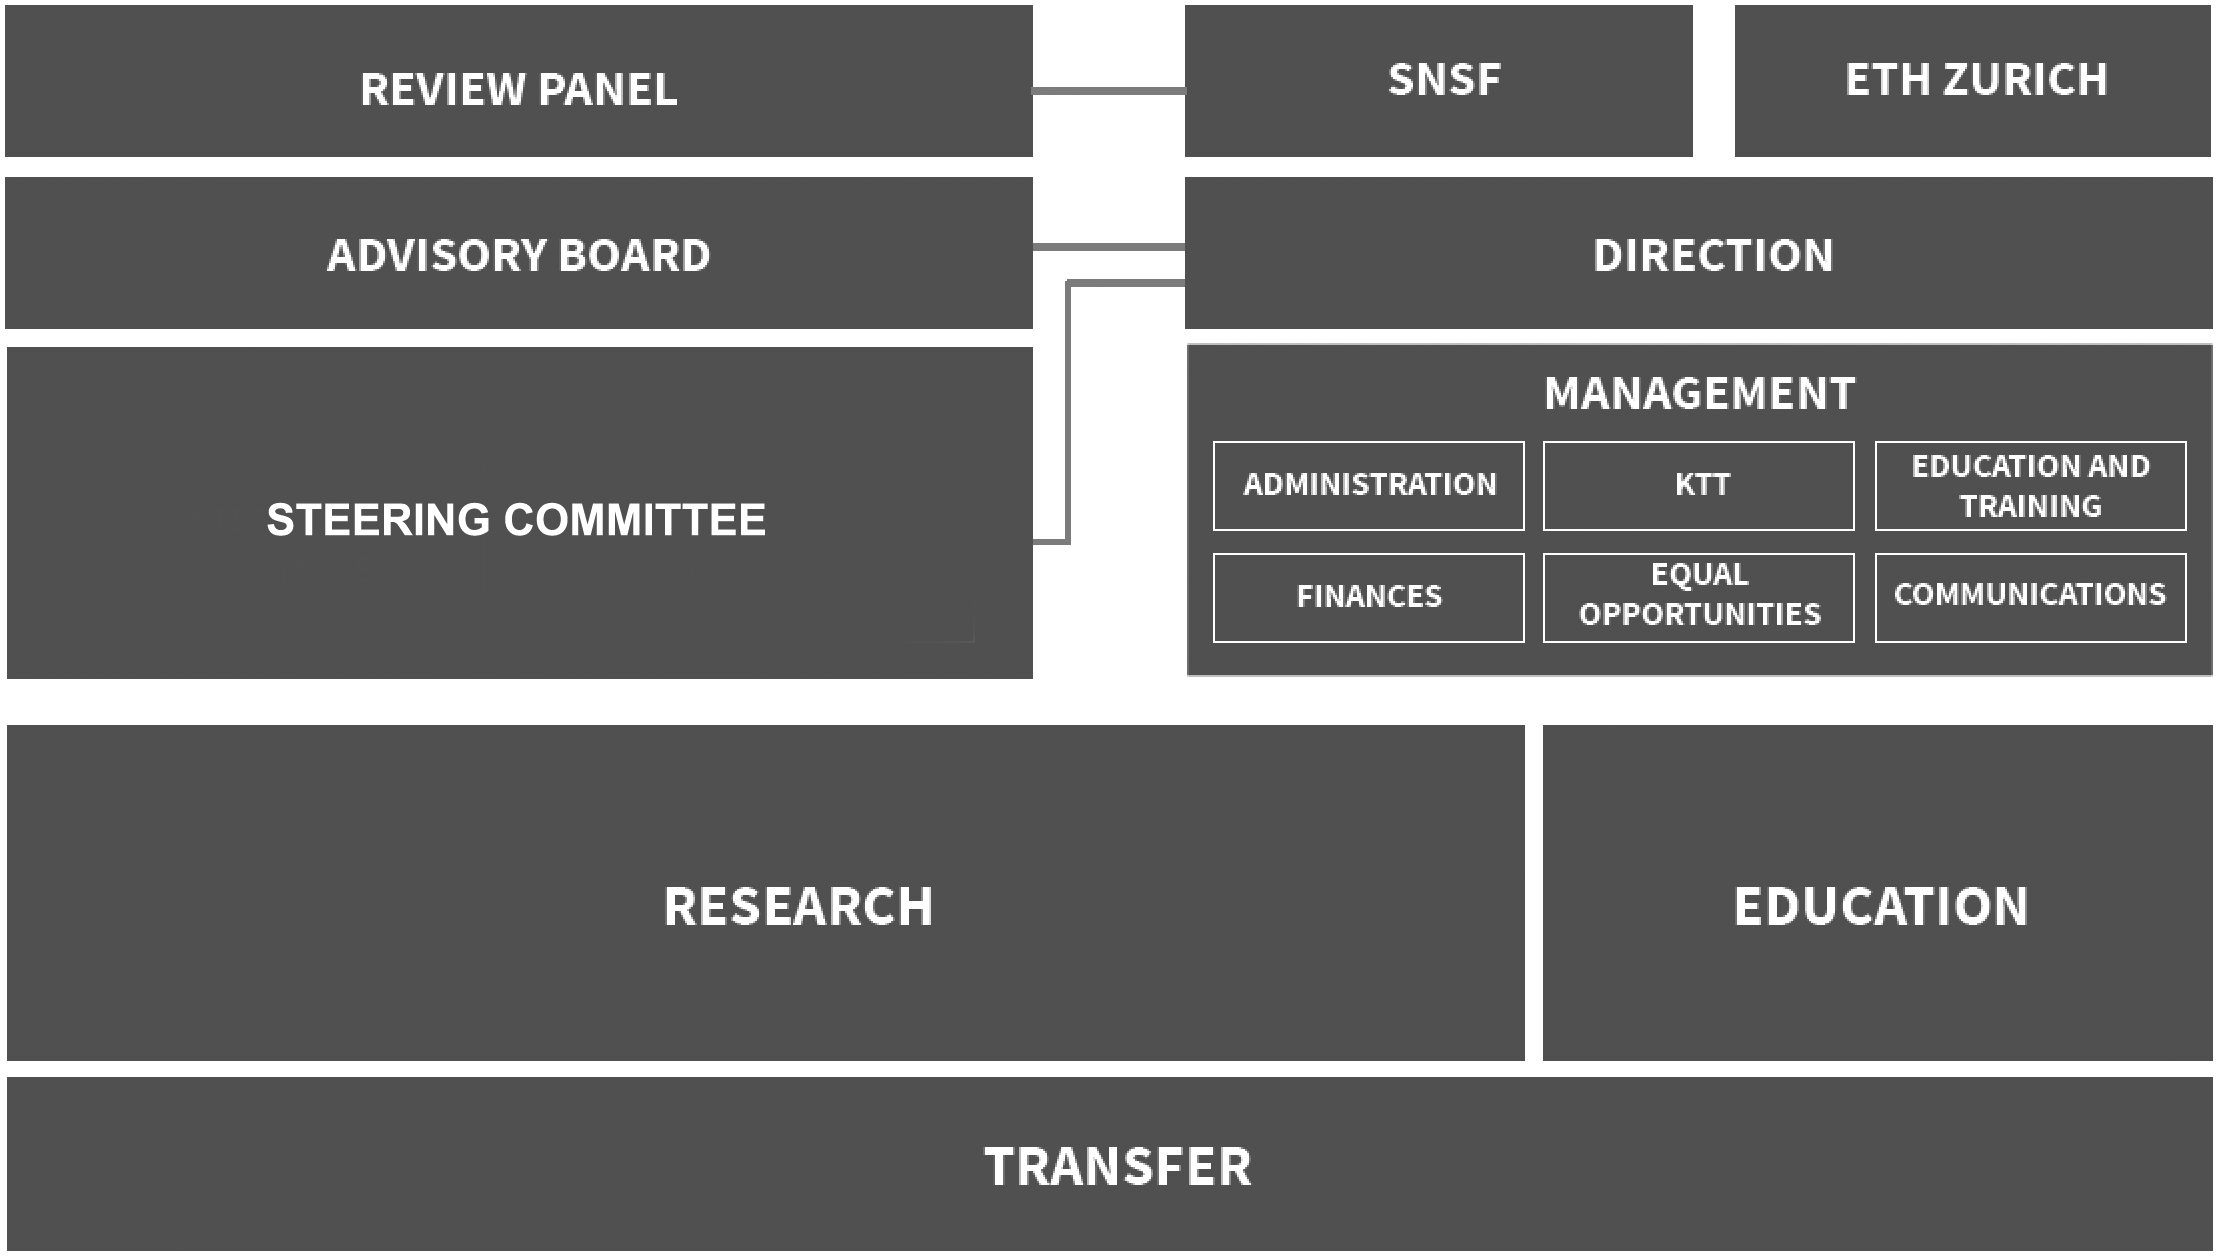 NCCR organisation